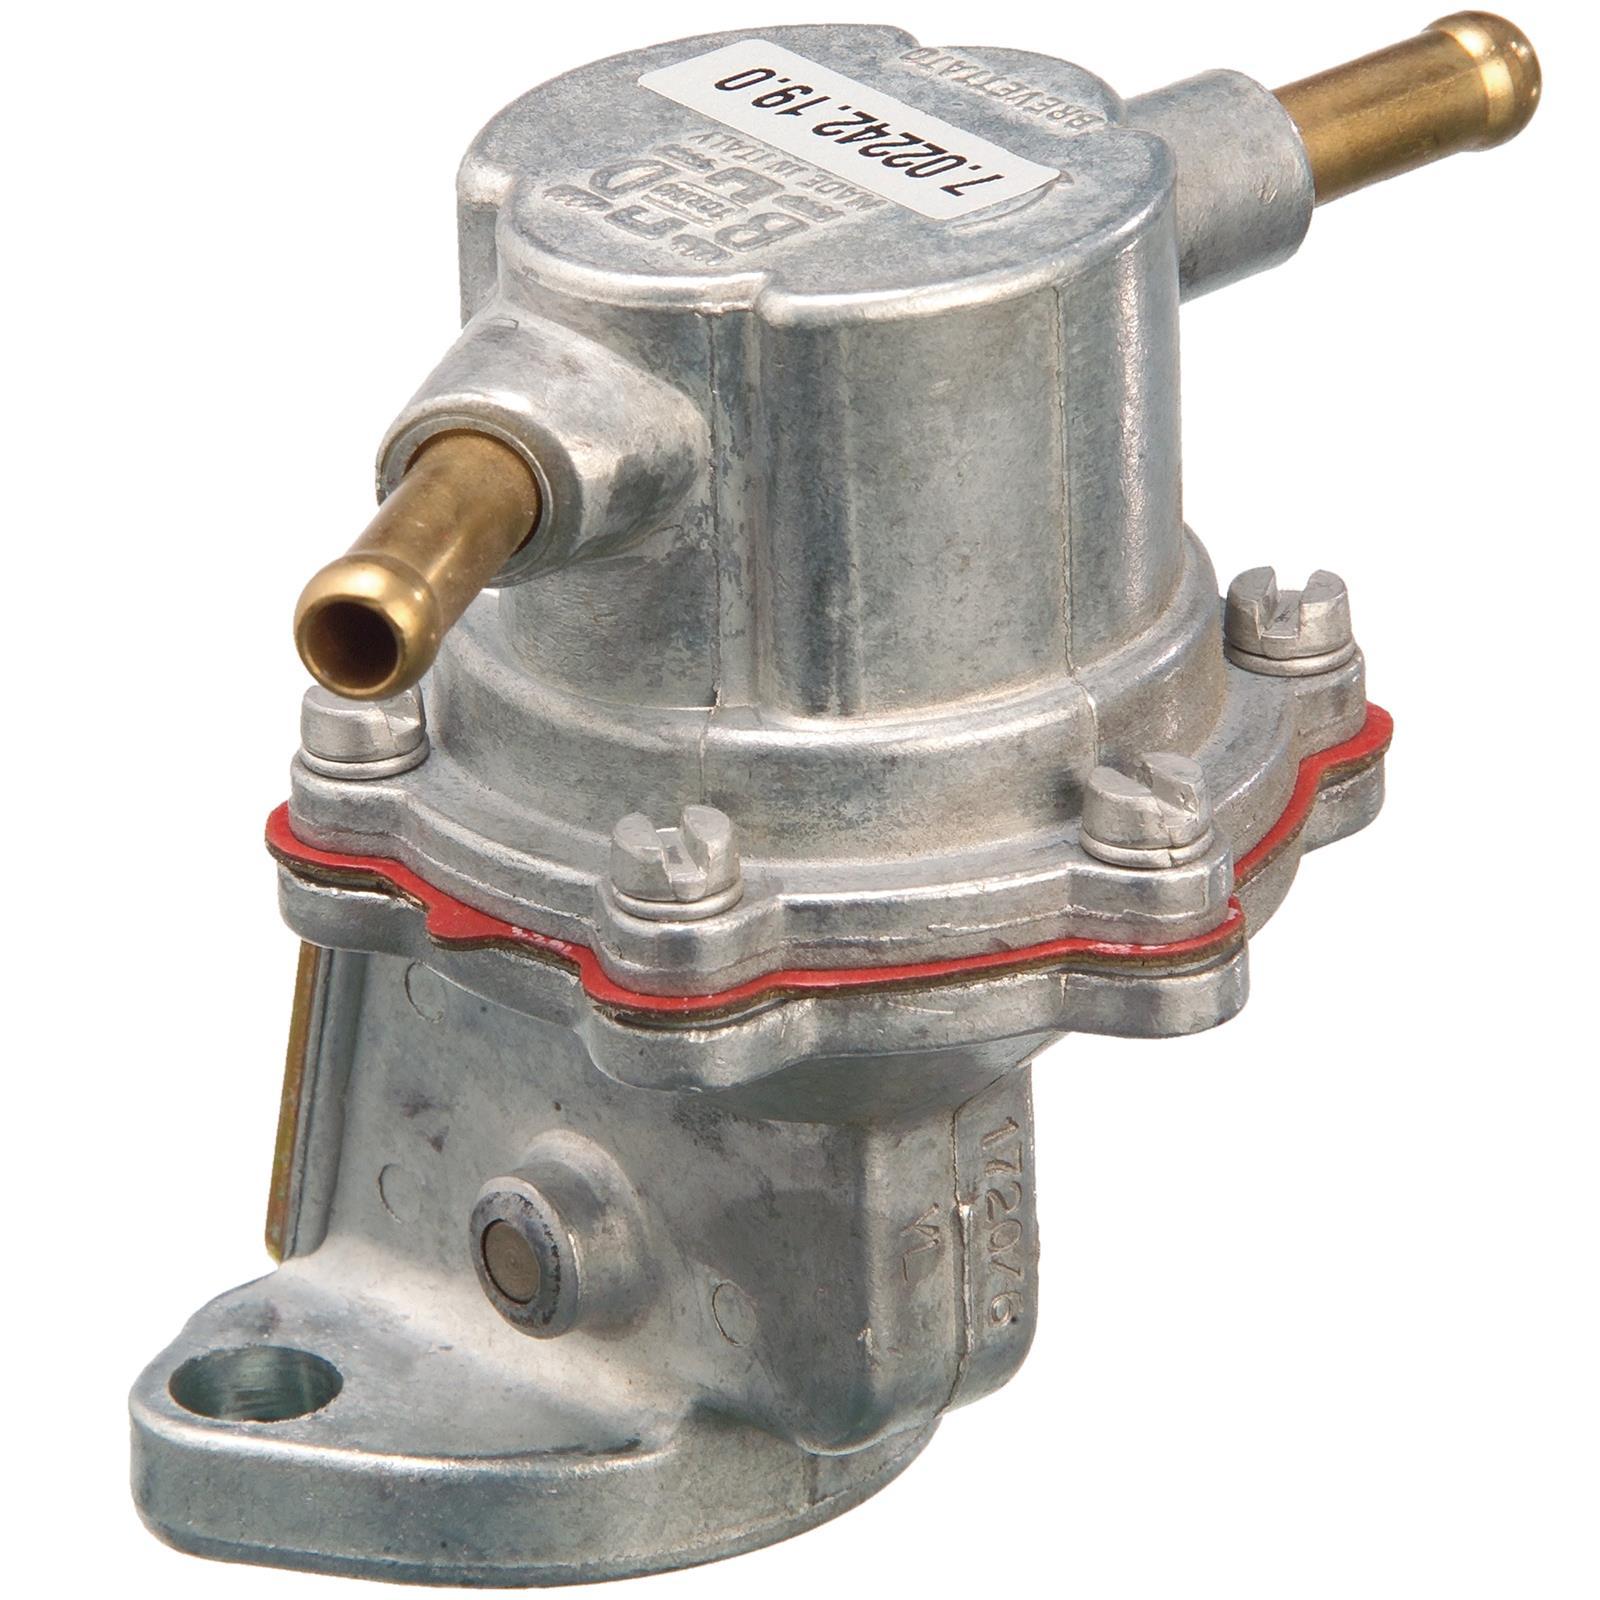 Mechanical Fuel Pump 7.02242.25.0 HELLA Automotive Performance ...